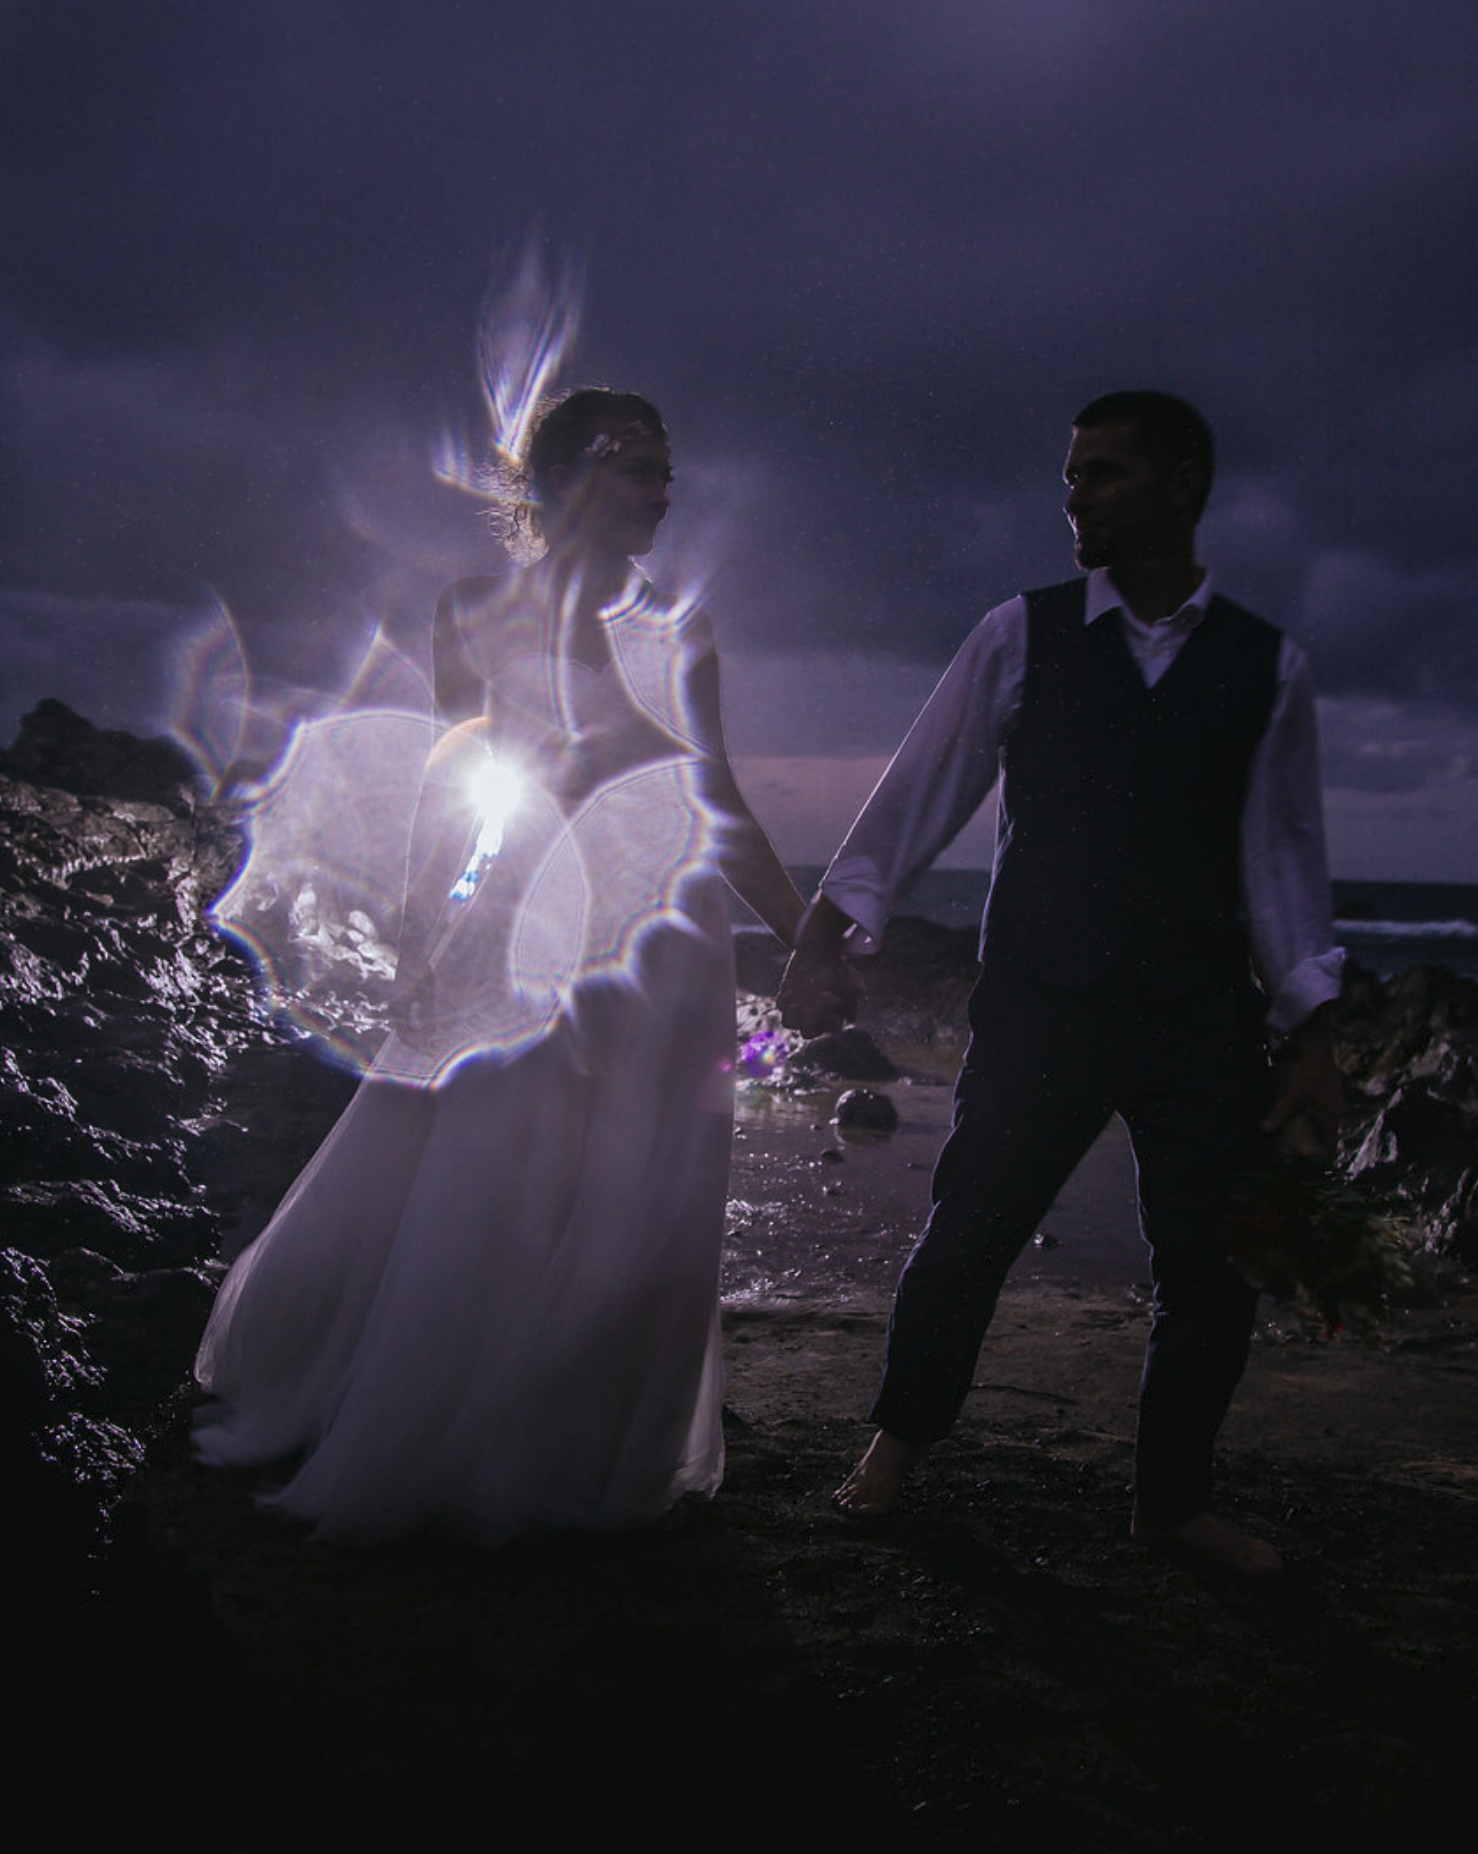 chris-j-evans-rain-wedding00002.png